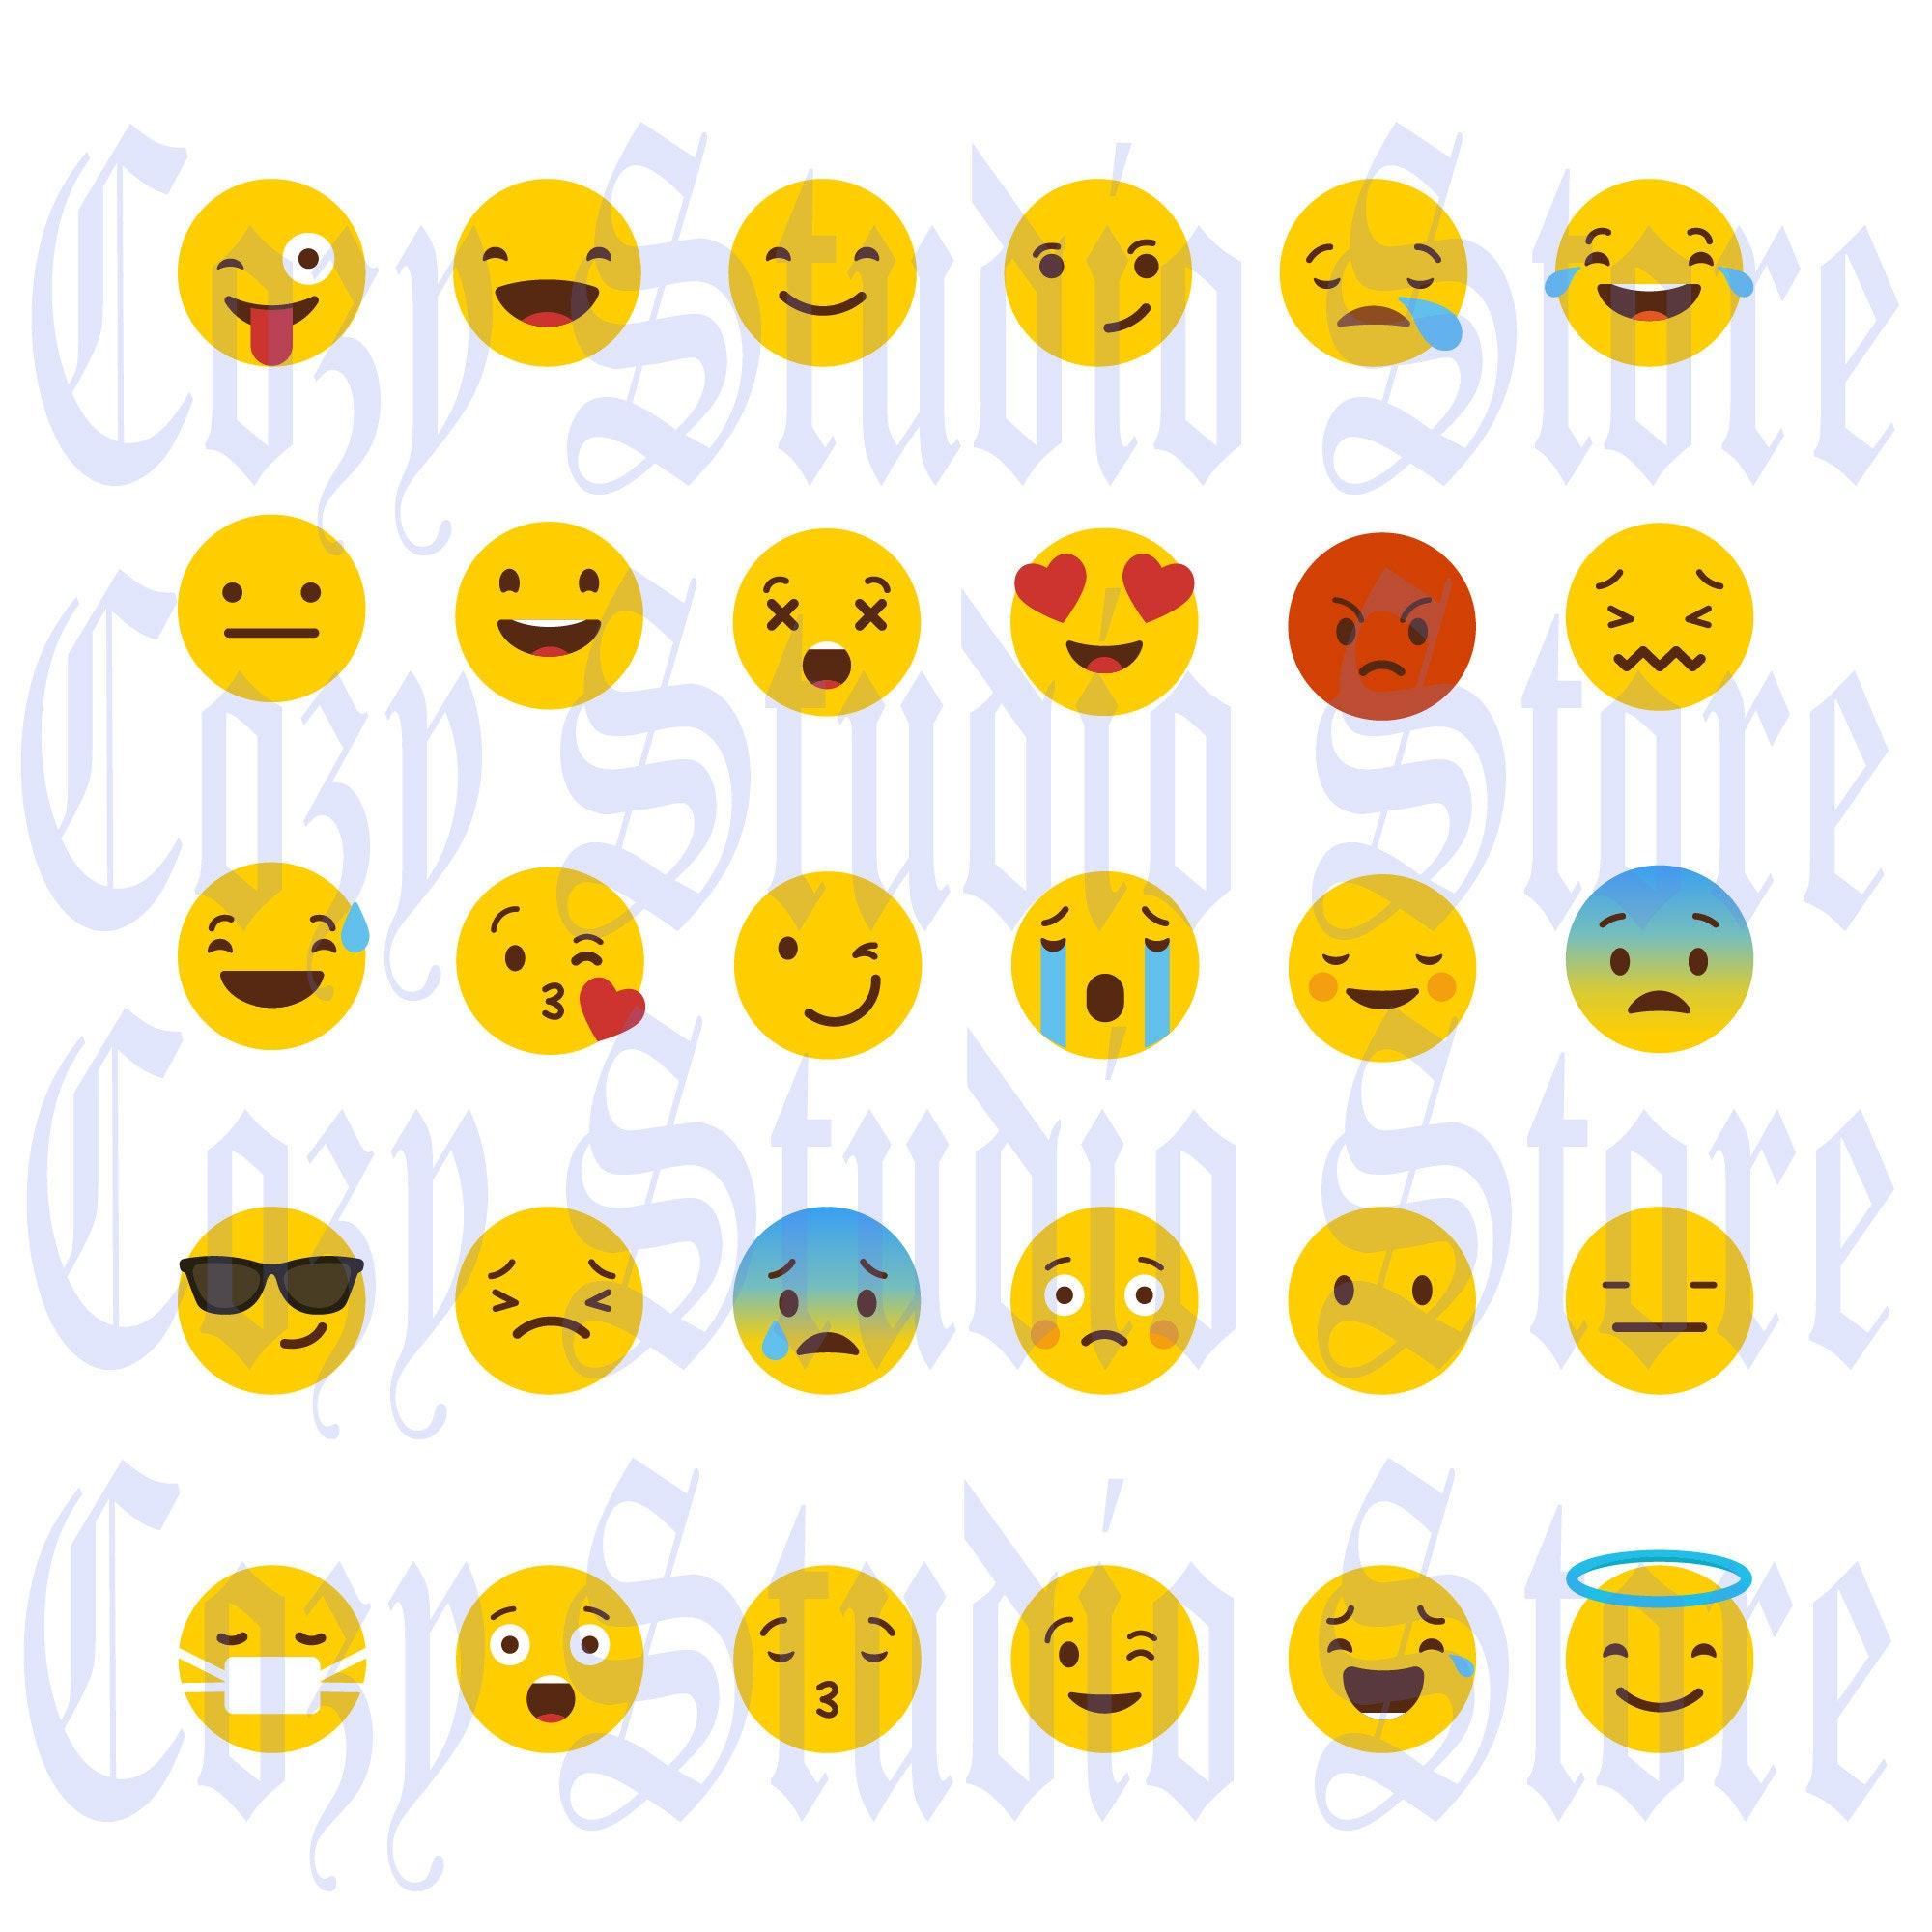 Emoji SVG, Emoji EPS, DXf, Emoji Collection, Emoji clipart,Smiley  faces,Emojis Eps, Printable emoji, Smiley Svg,Emoji Svg bundle,digital